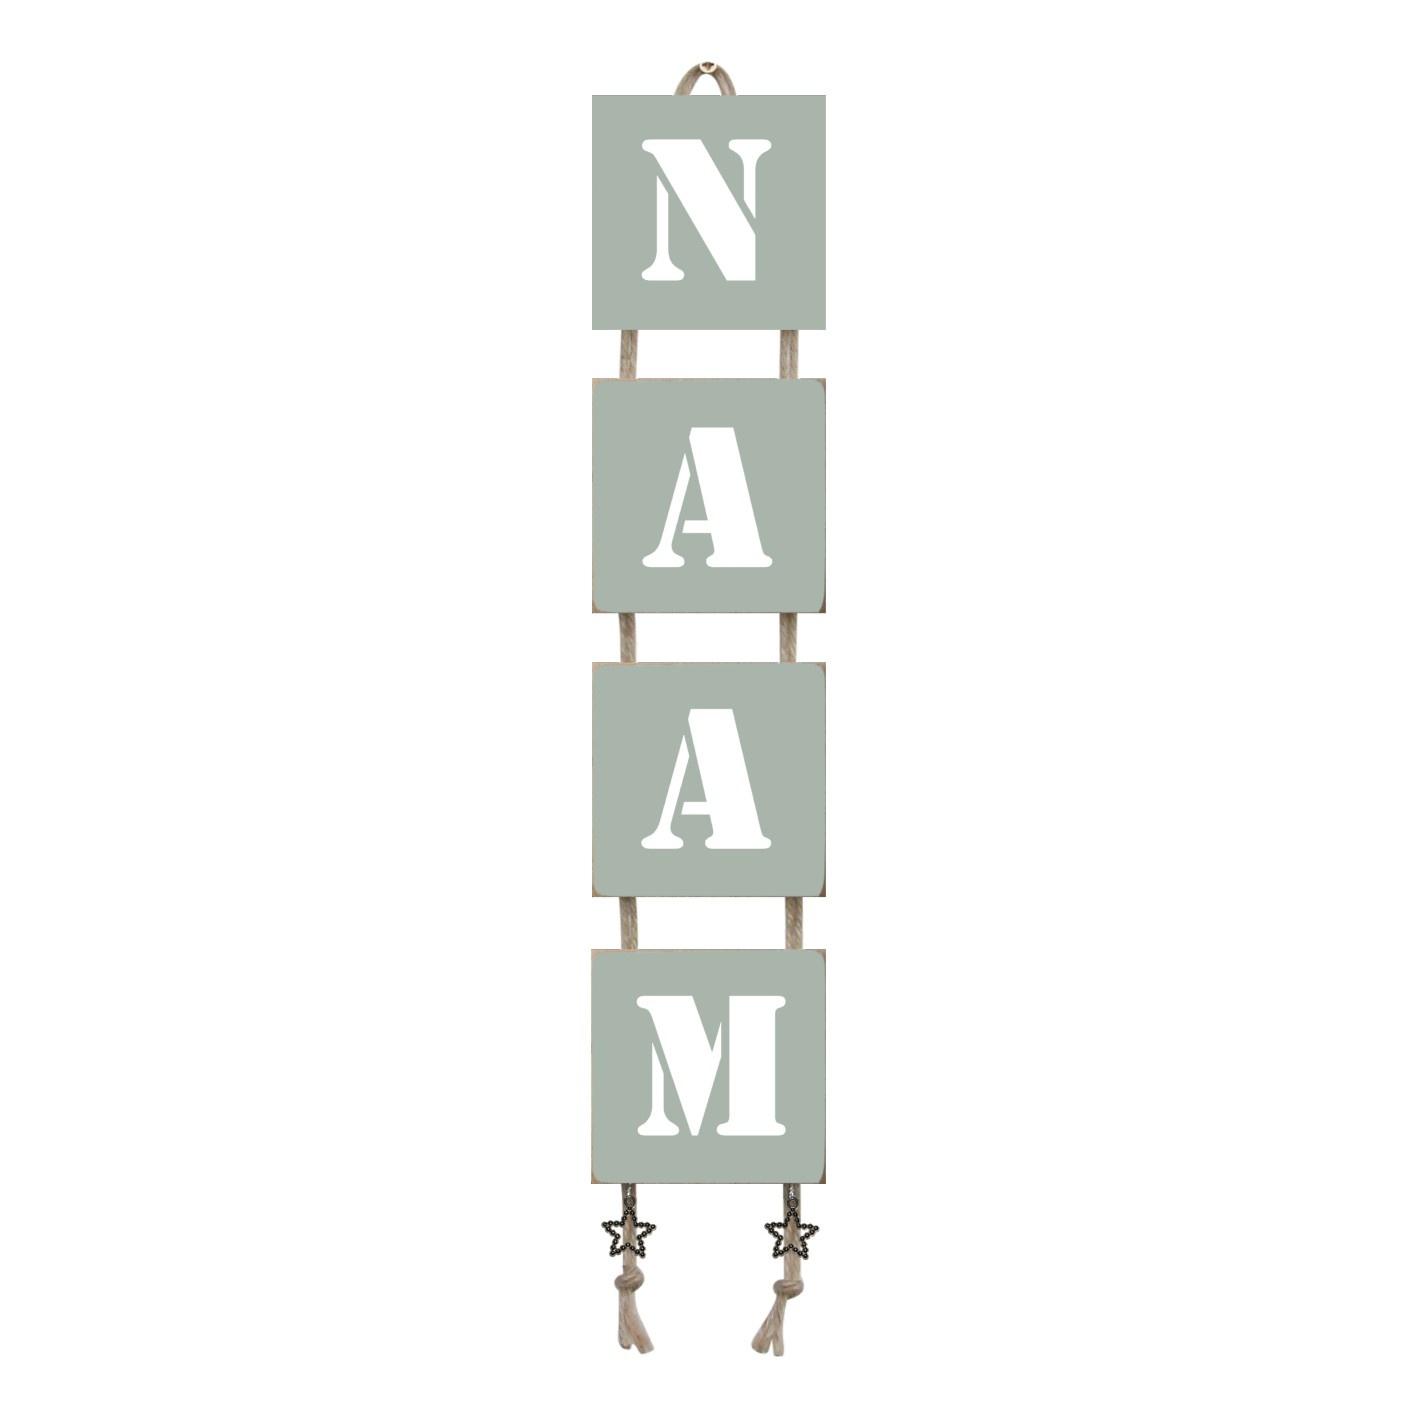 Naamladder early dew stencil